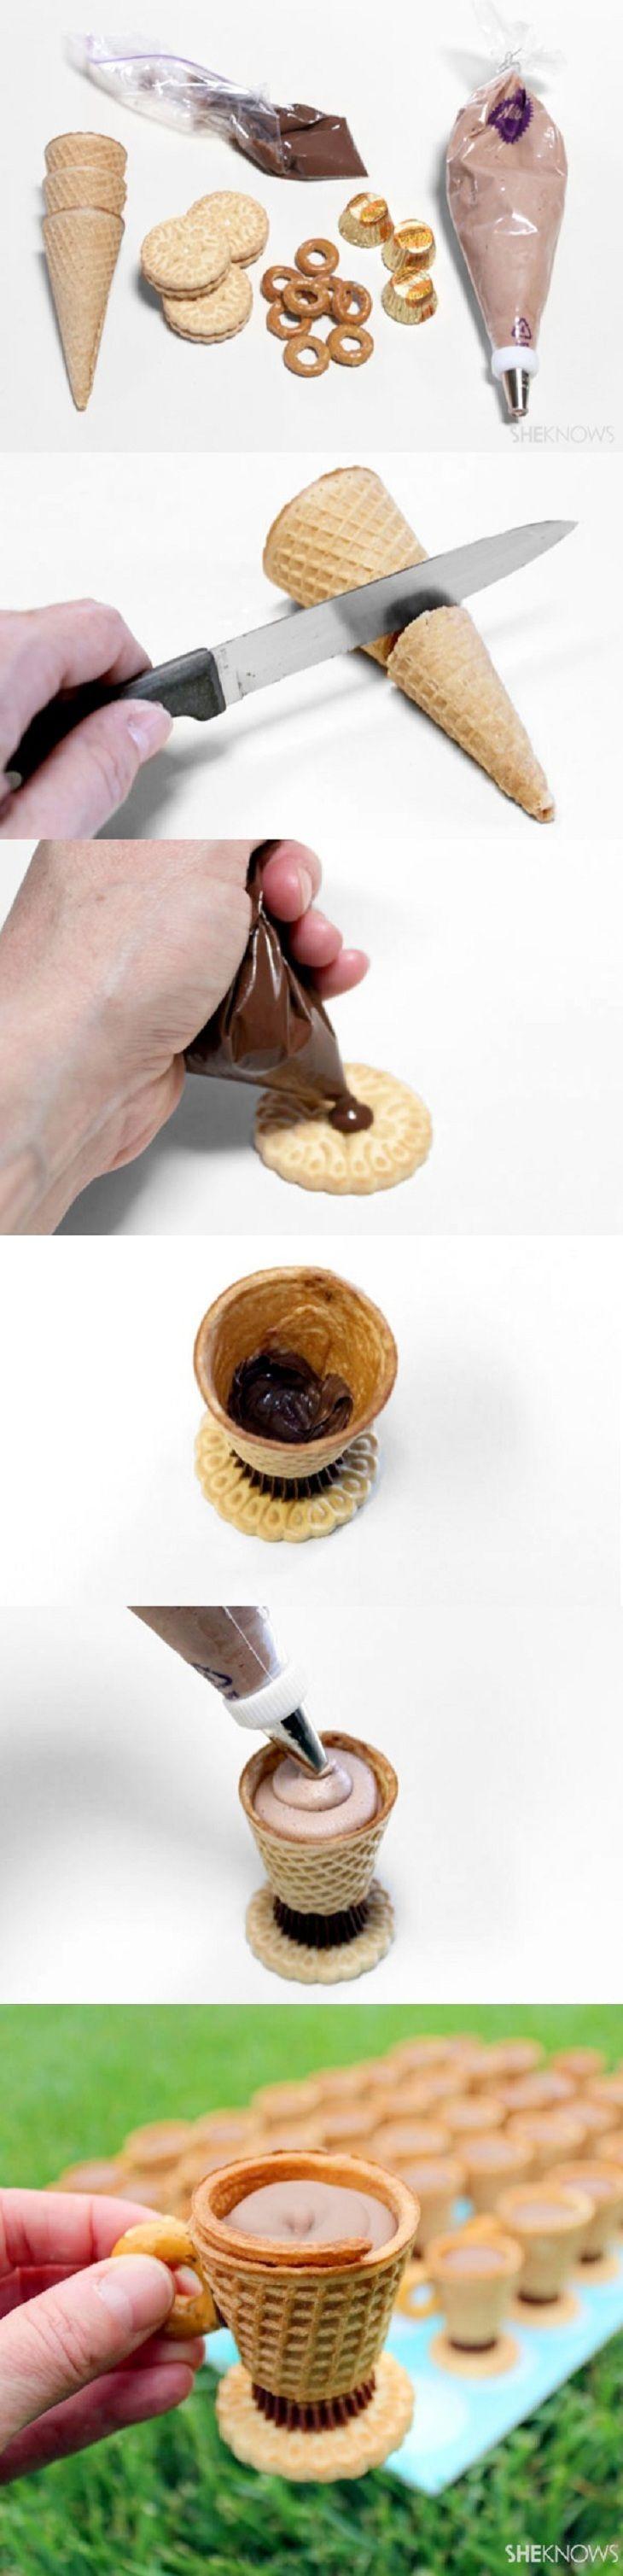 DIY Tea Party Teacup Cookie Cups